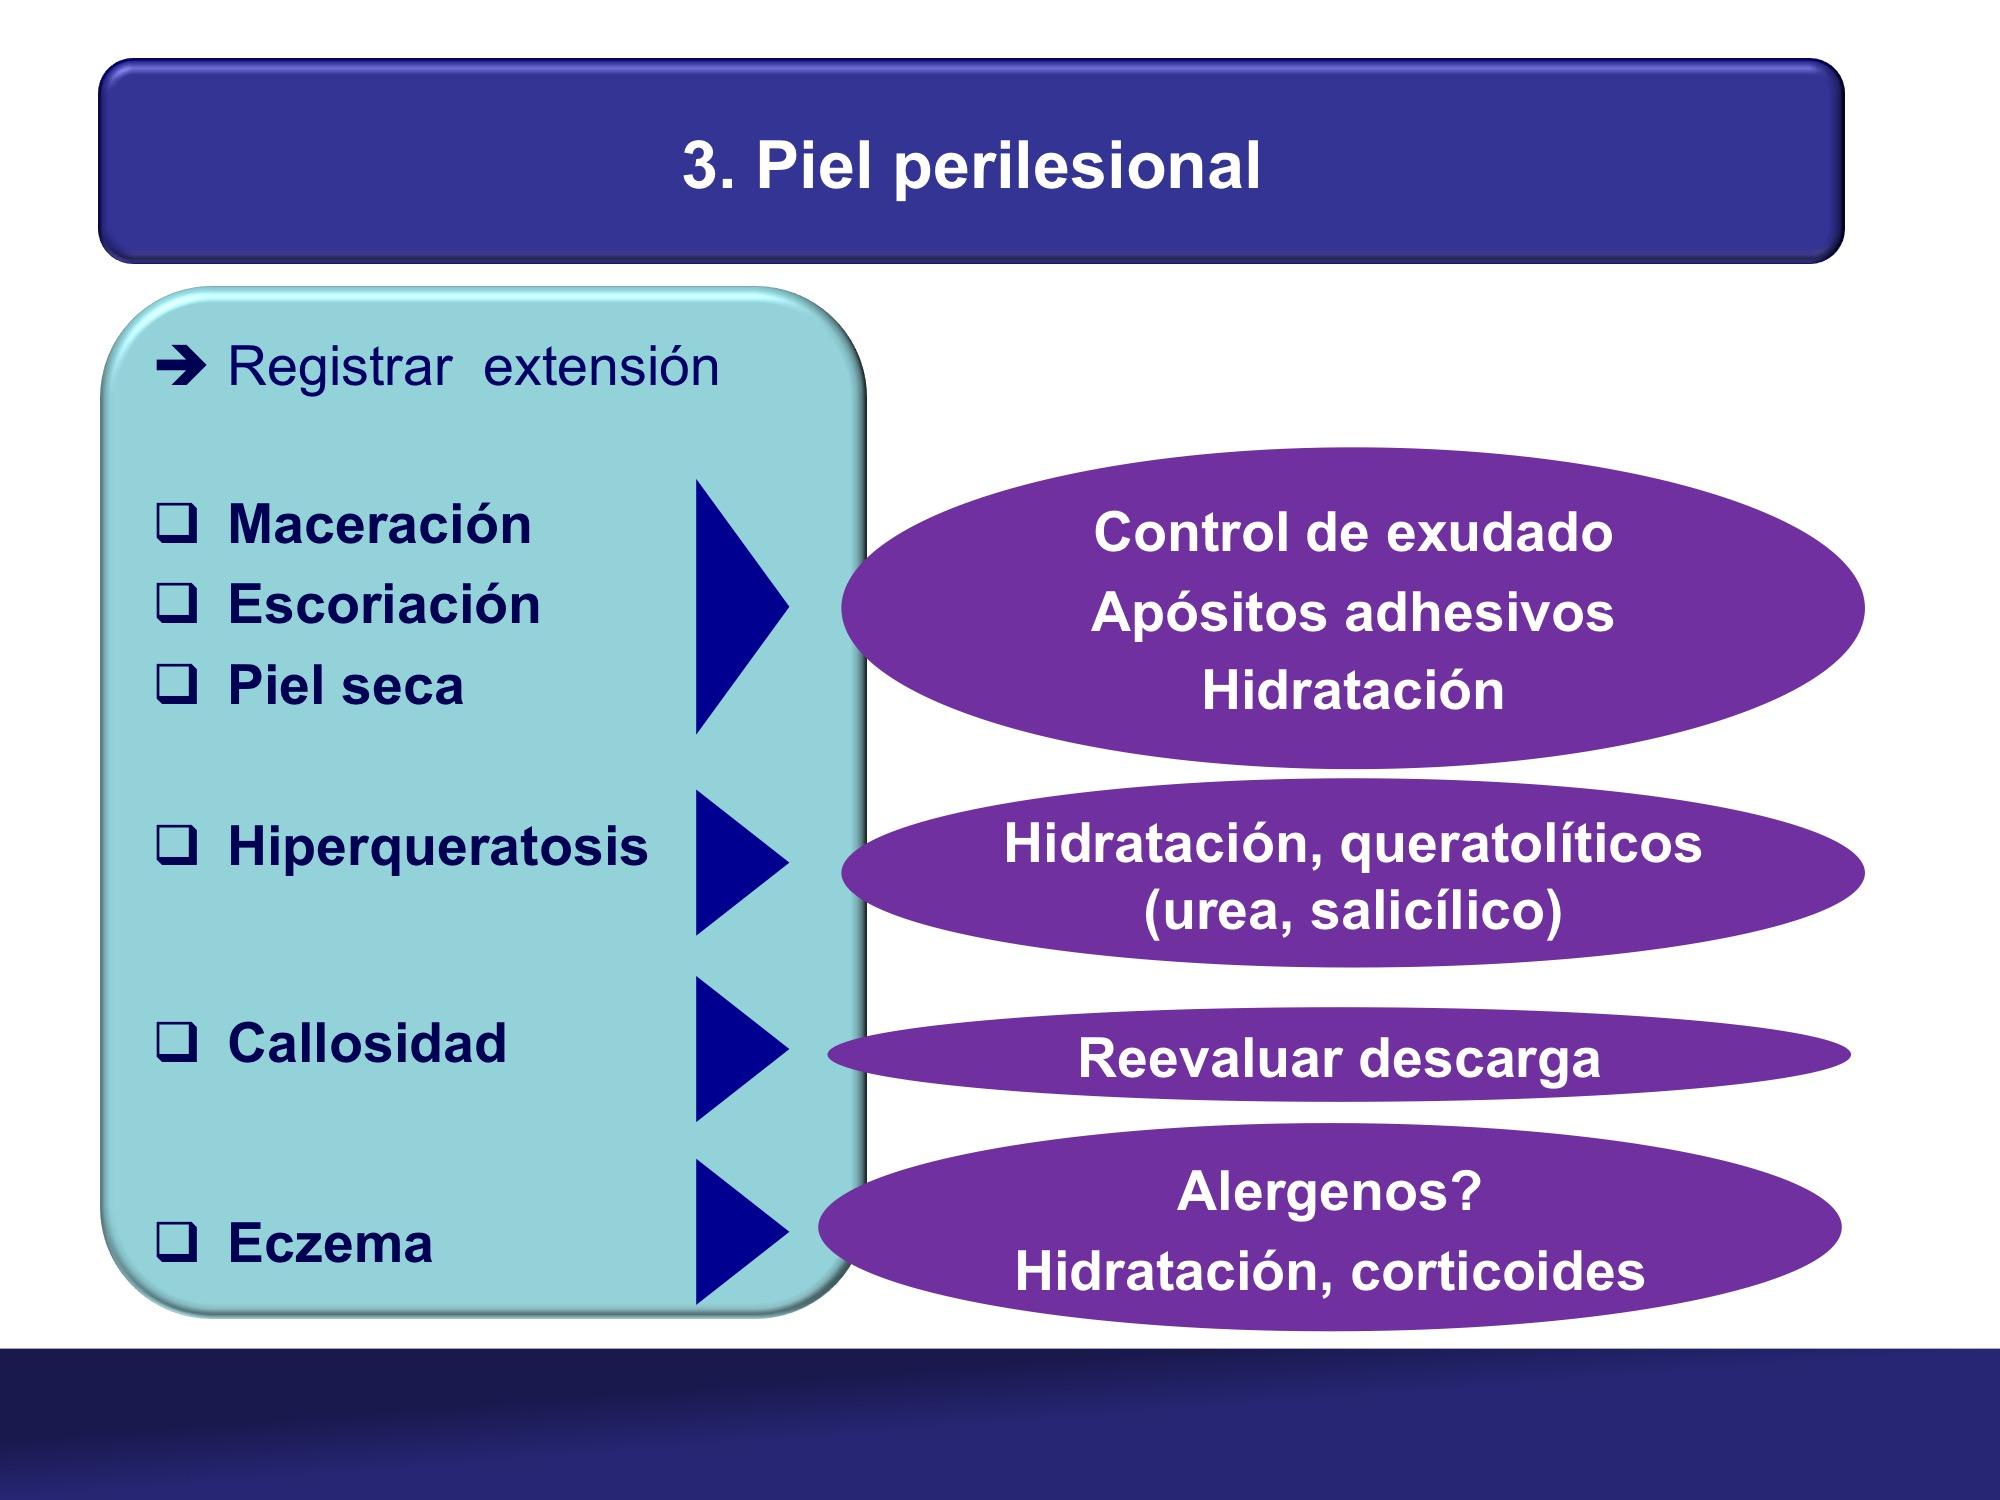 Piel perilesional